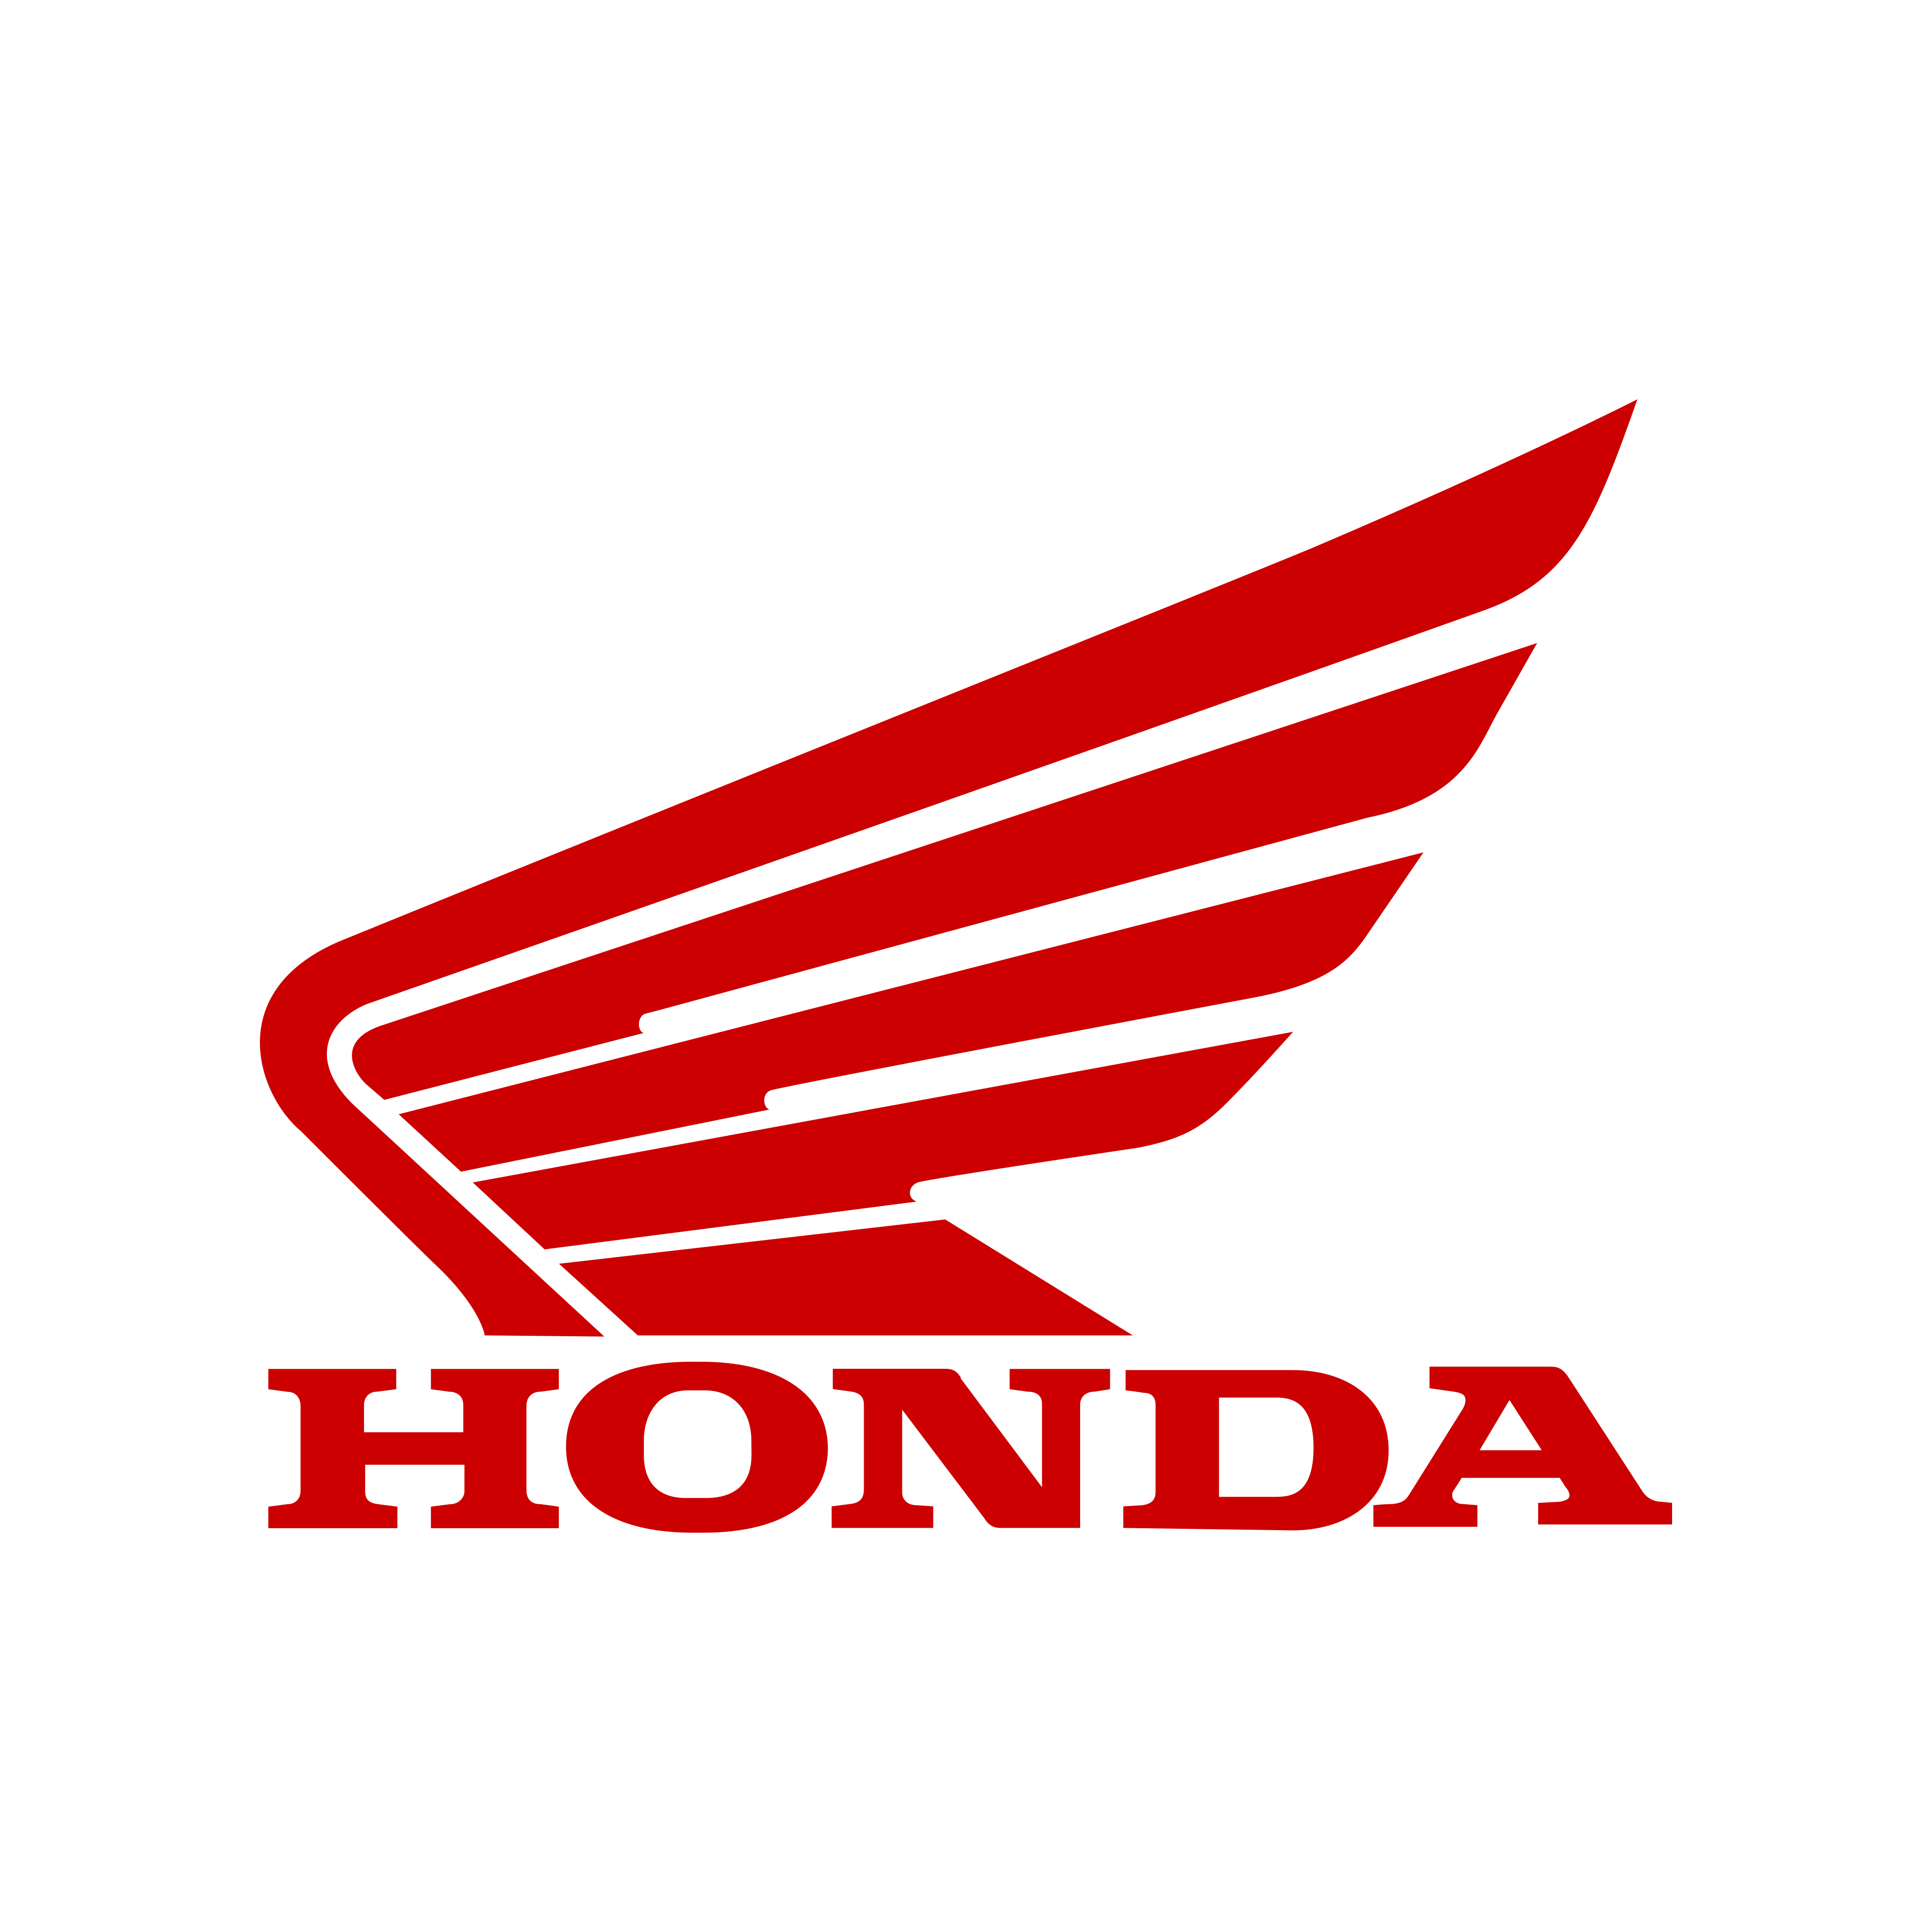 honda motos logo 0 - Honda Motorcycles Logo